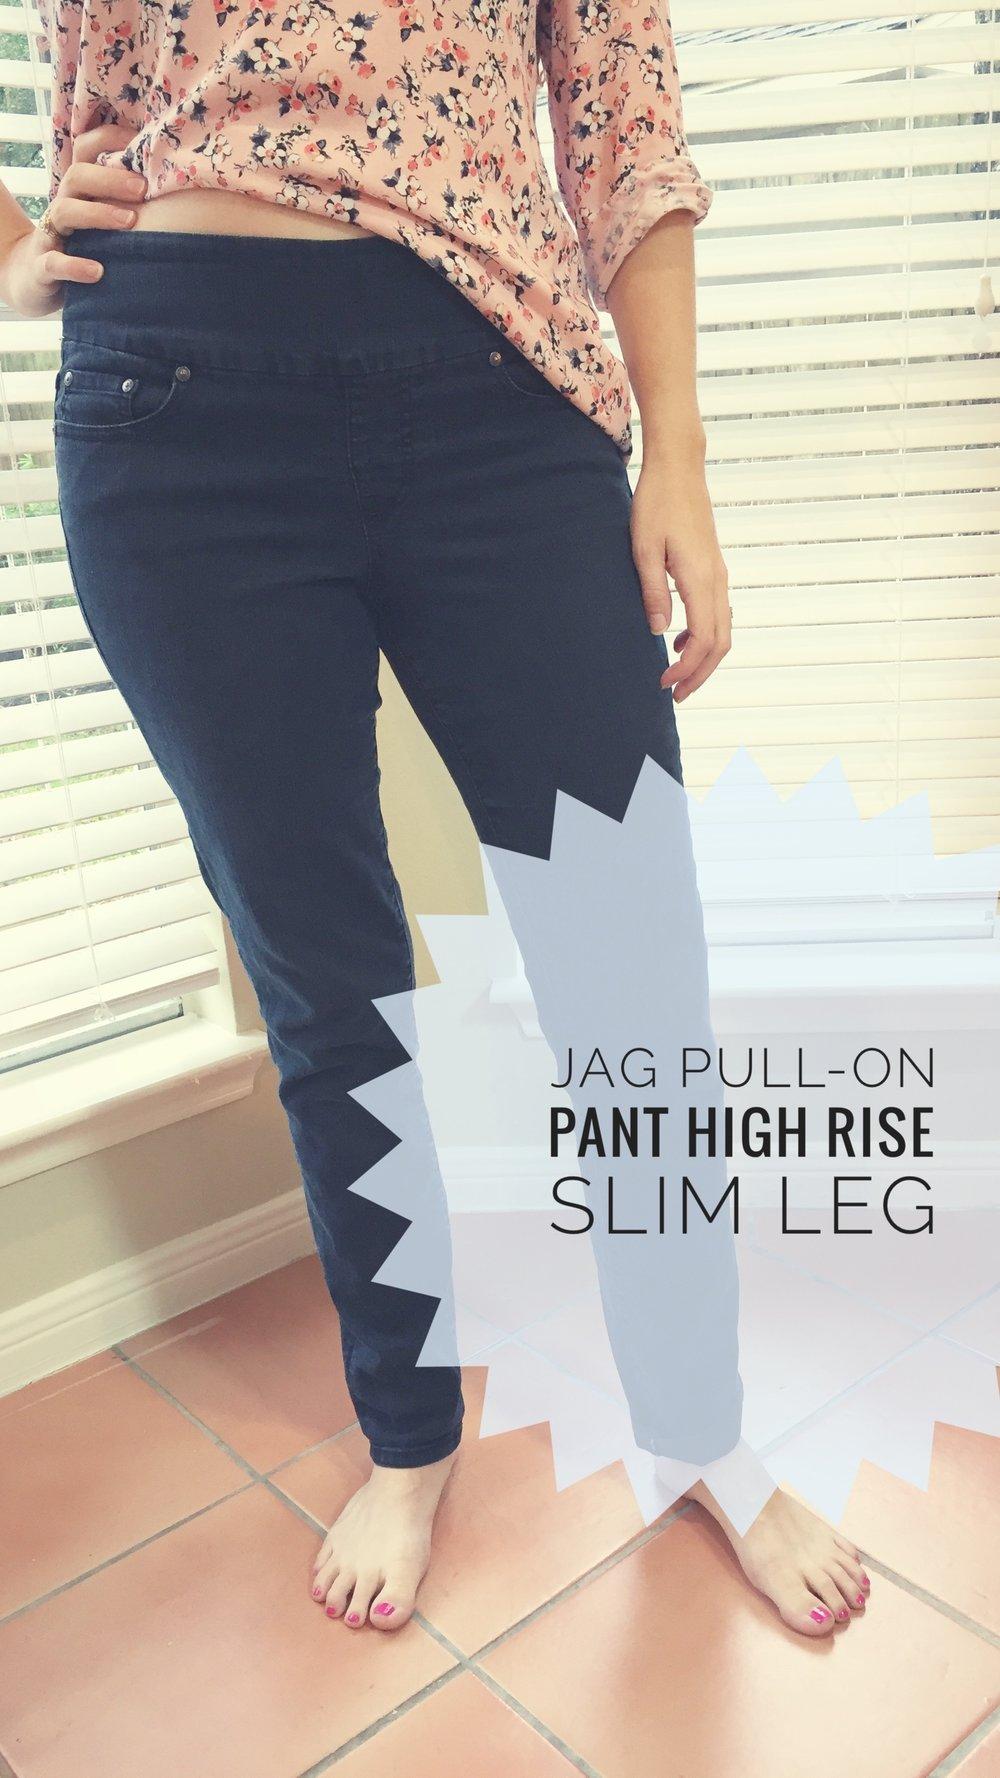 Maternity Jeans Test, Lisa Rutledge Midwife - 1.jpg